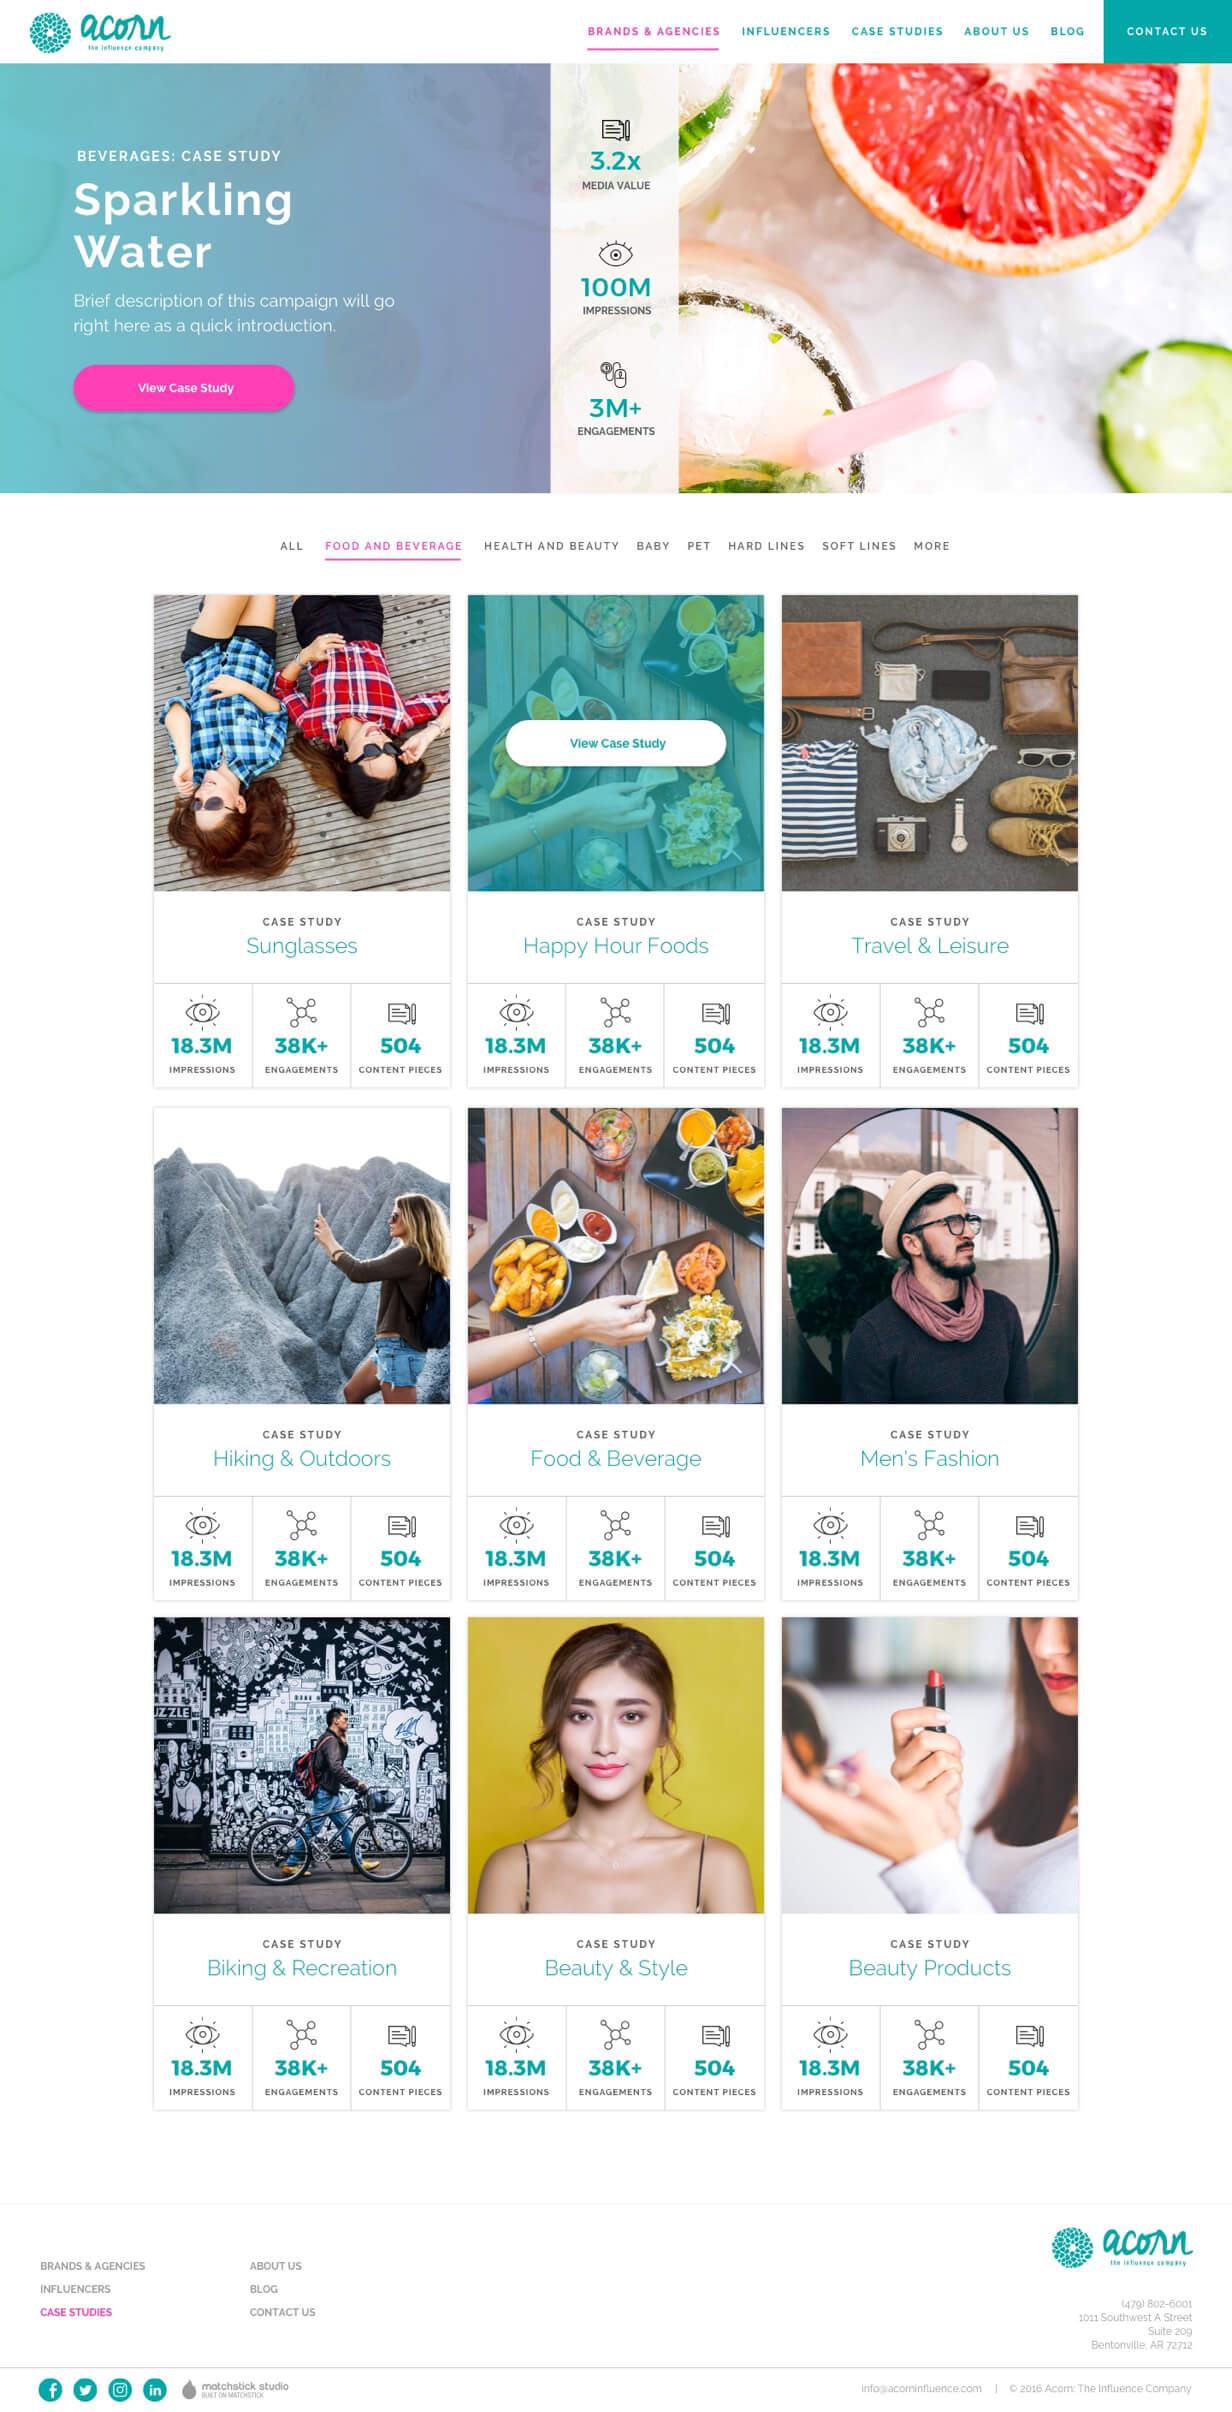 acorn influence case study page website design